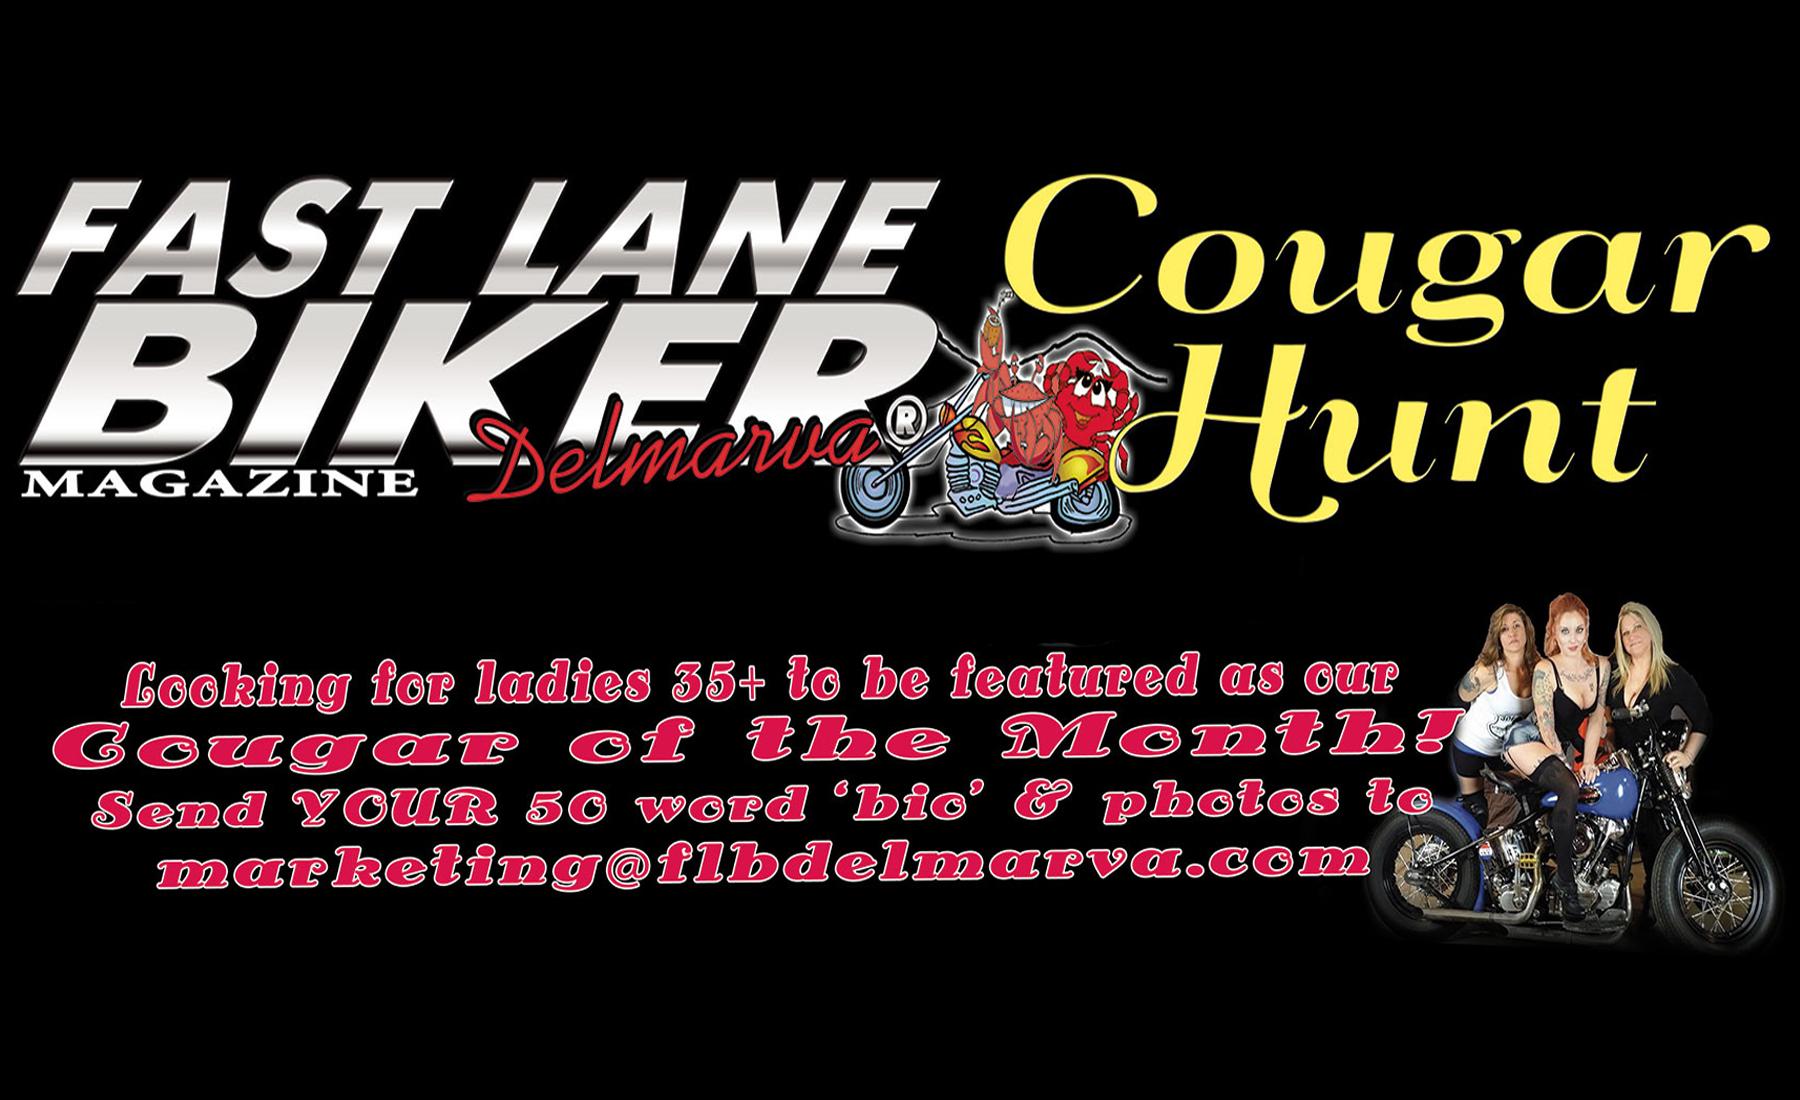 http://fastlanebikerdelmarva.com/wp/wp-content/uploads/2016/03/Cougar-Banner1.jpg